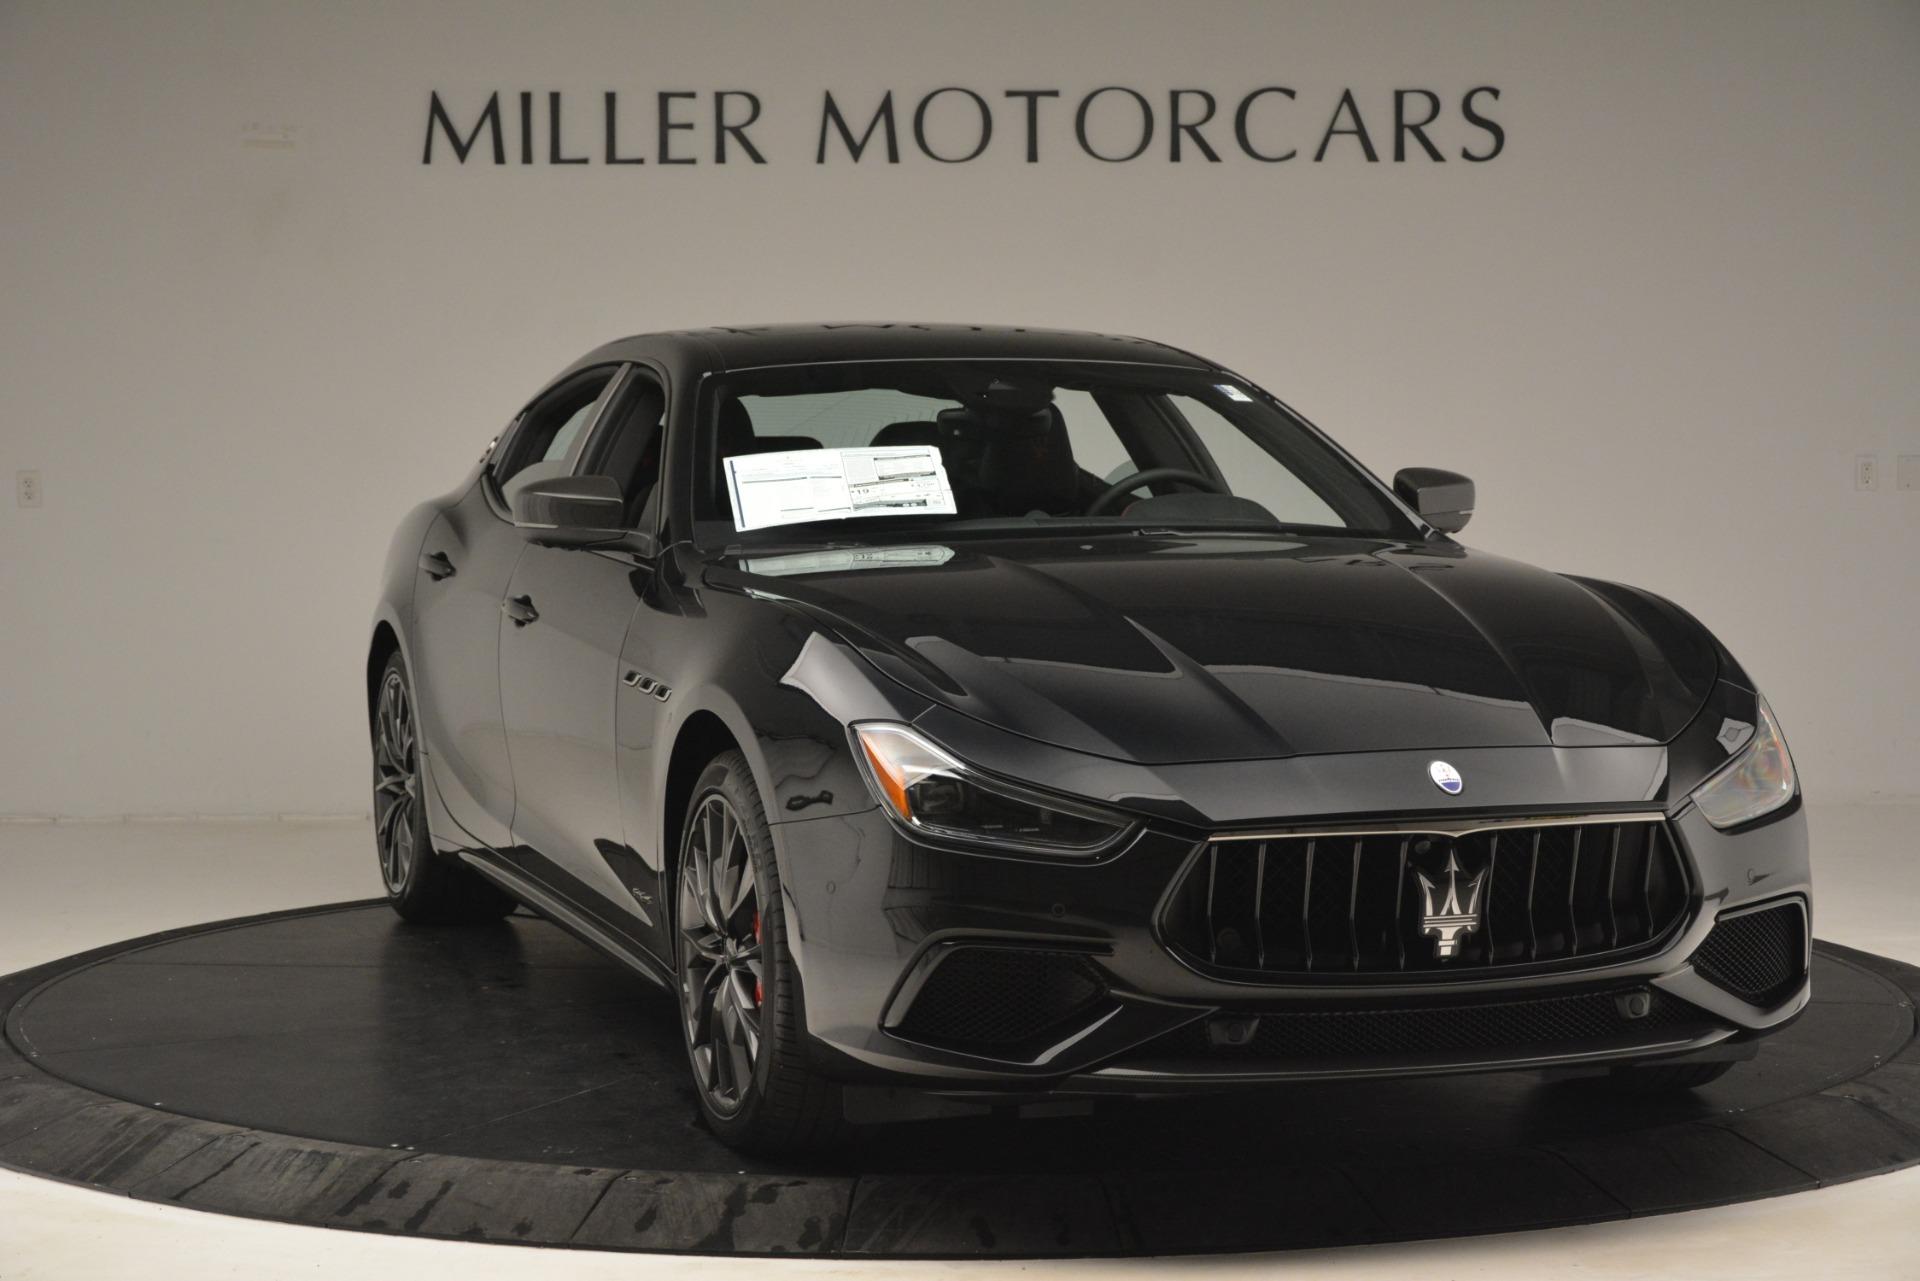 New 2019 Maserati Ghibli S Q4 GranSport For Sale In Westport, CT 2924_p11